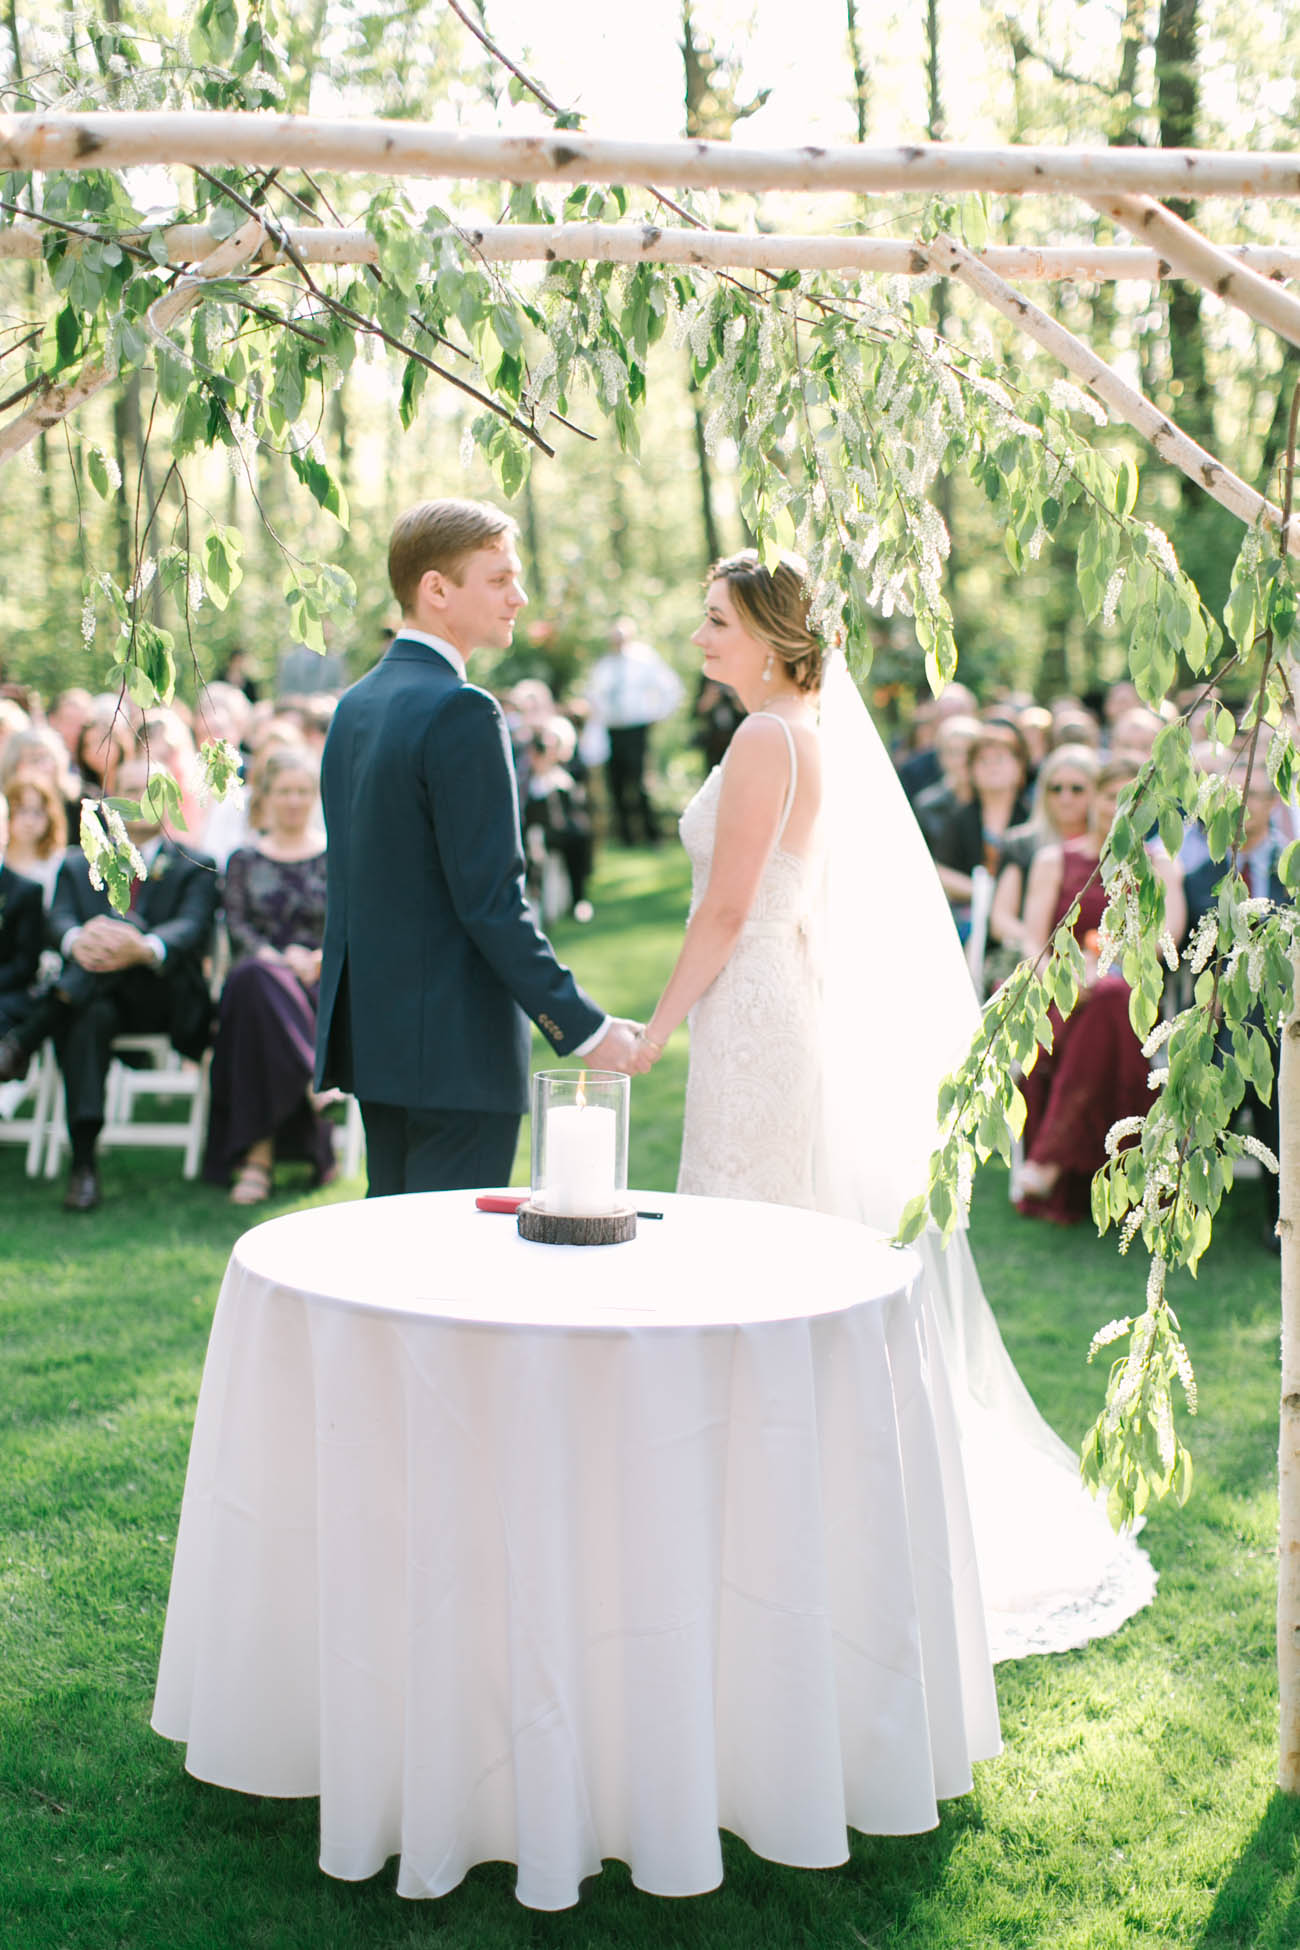 kateweinsteinphoto_schlitz_audubon_milwaukee_wedding-203.jpg